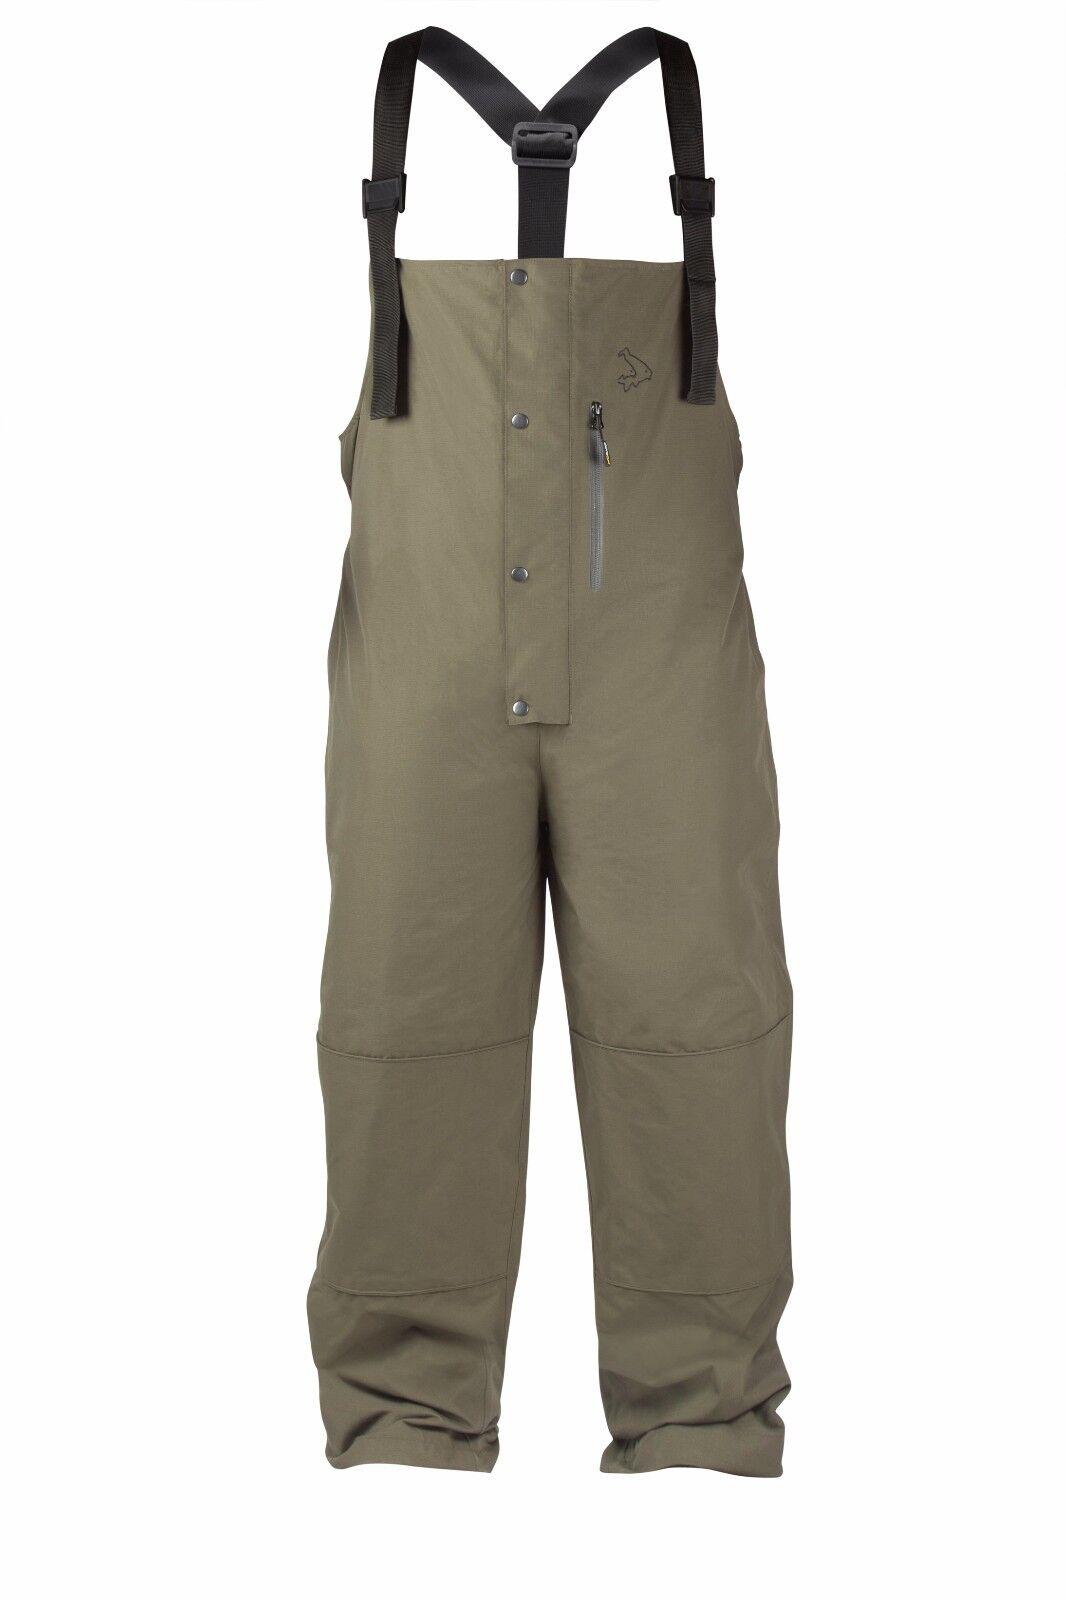 Avid Carp Blizzard Ripstop Waterproof Fishing Bib & Brace Trousers All Sizes